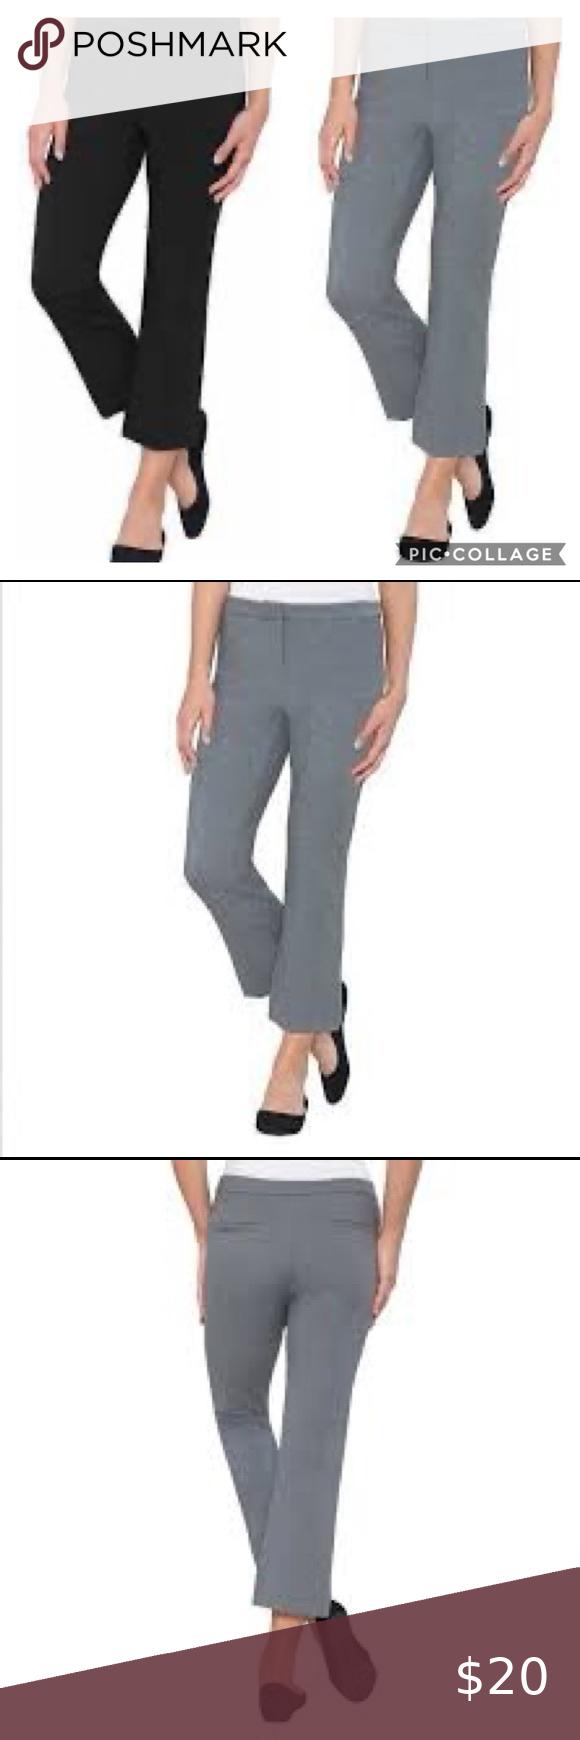 2 Pairs Max Mia Crop Dress Work Pants Black Gray In 2020 Dresses For Work Crop Dress Pants For Women [ 1740 x 580 Pixel ]